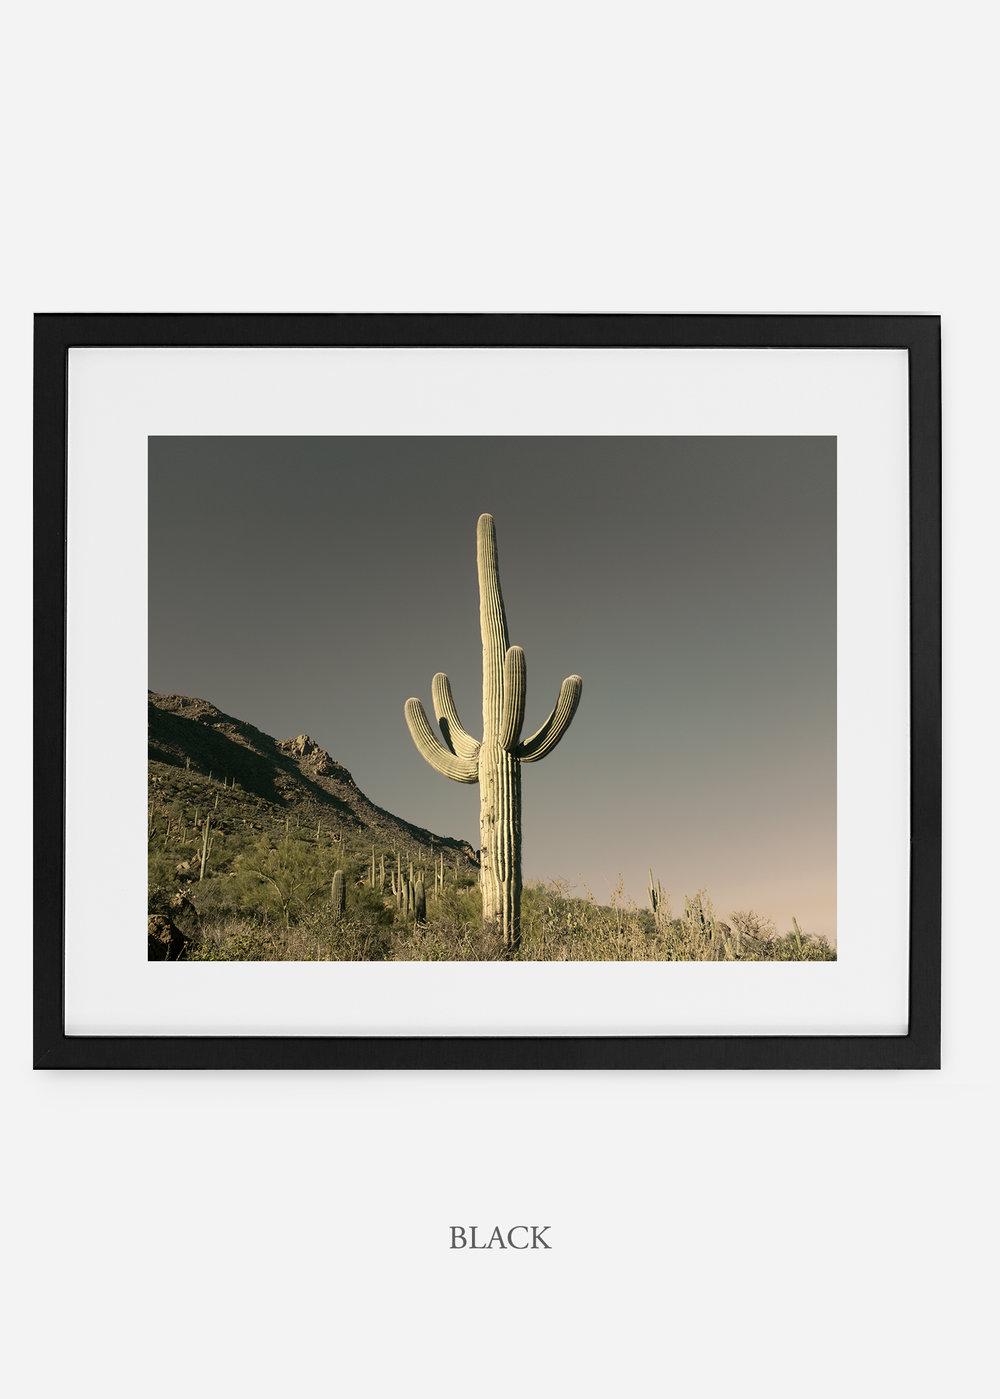 blackframe-saguaroNo.19-wildercalifornia-art-wallart-cactusprint-homedecor-prints-arizona-botanical-artwork-interiordesign.jpg